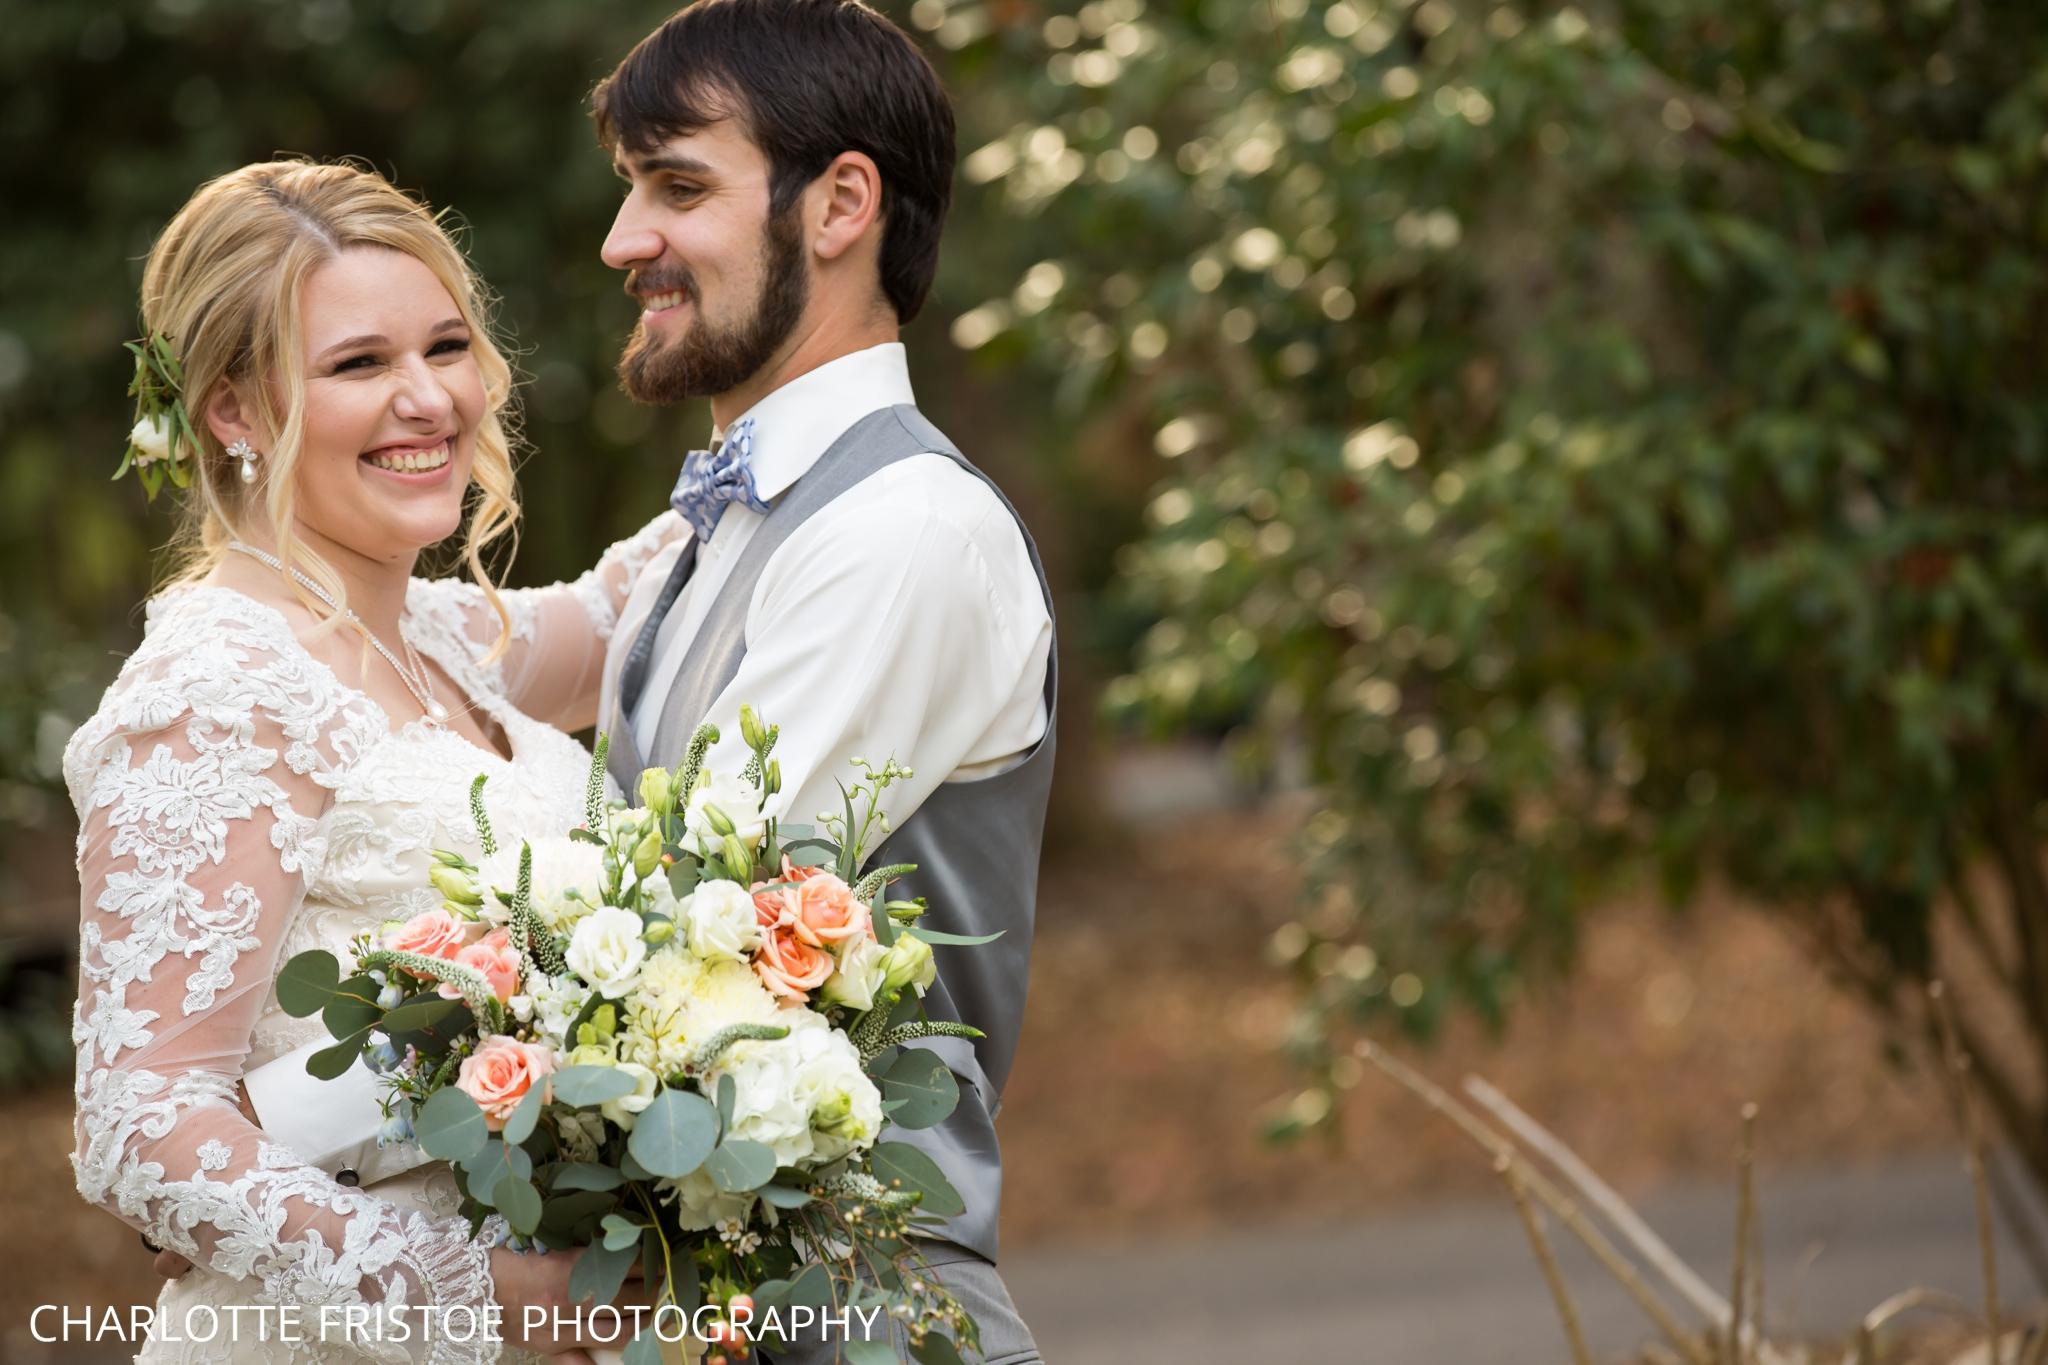 Charlotte Fristoe Photography Wedding-51.jpg